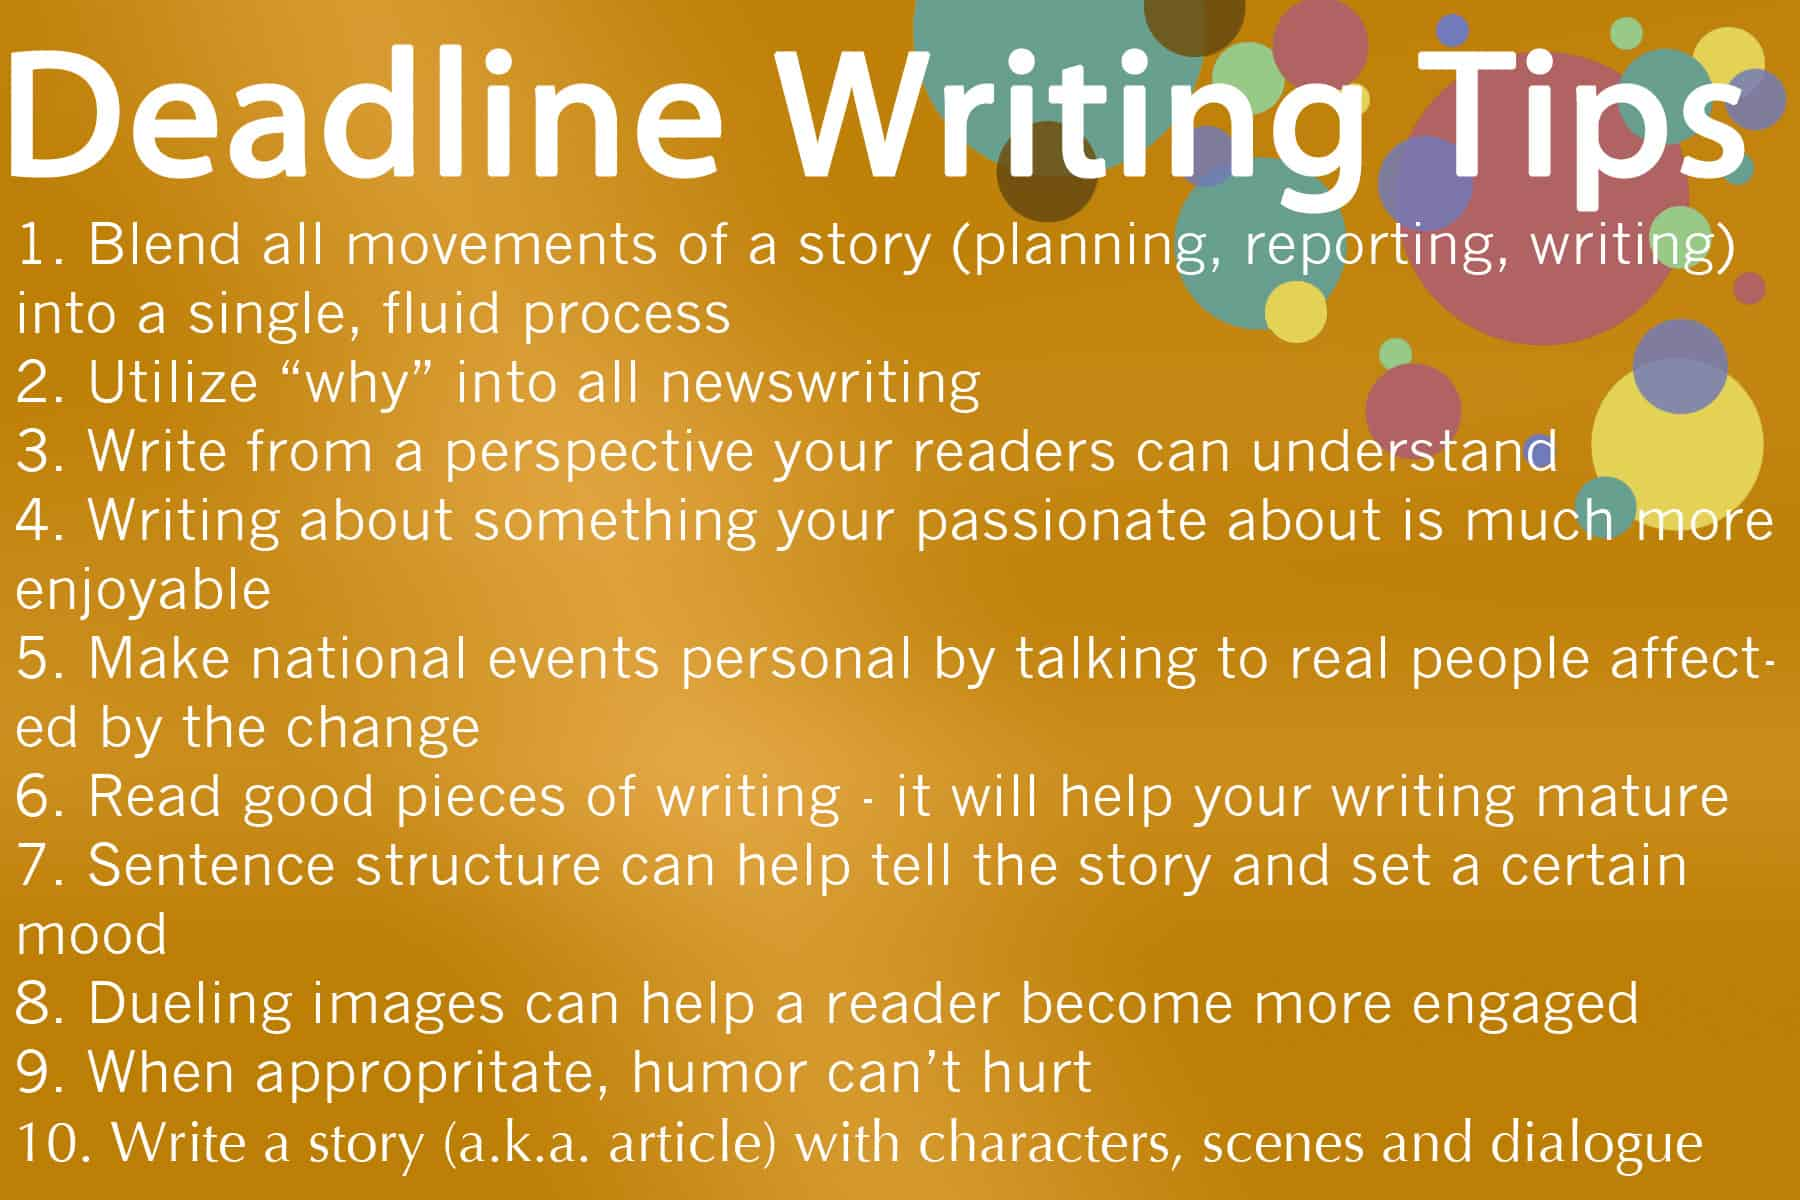 Deadline Writing